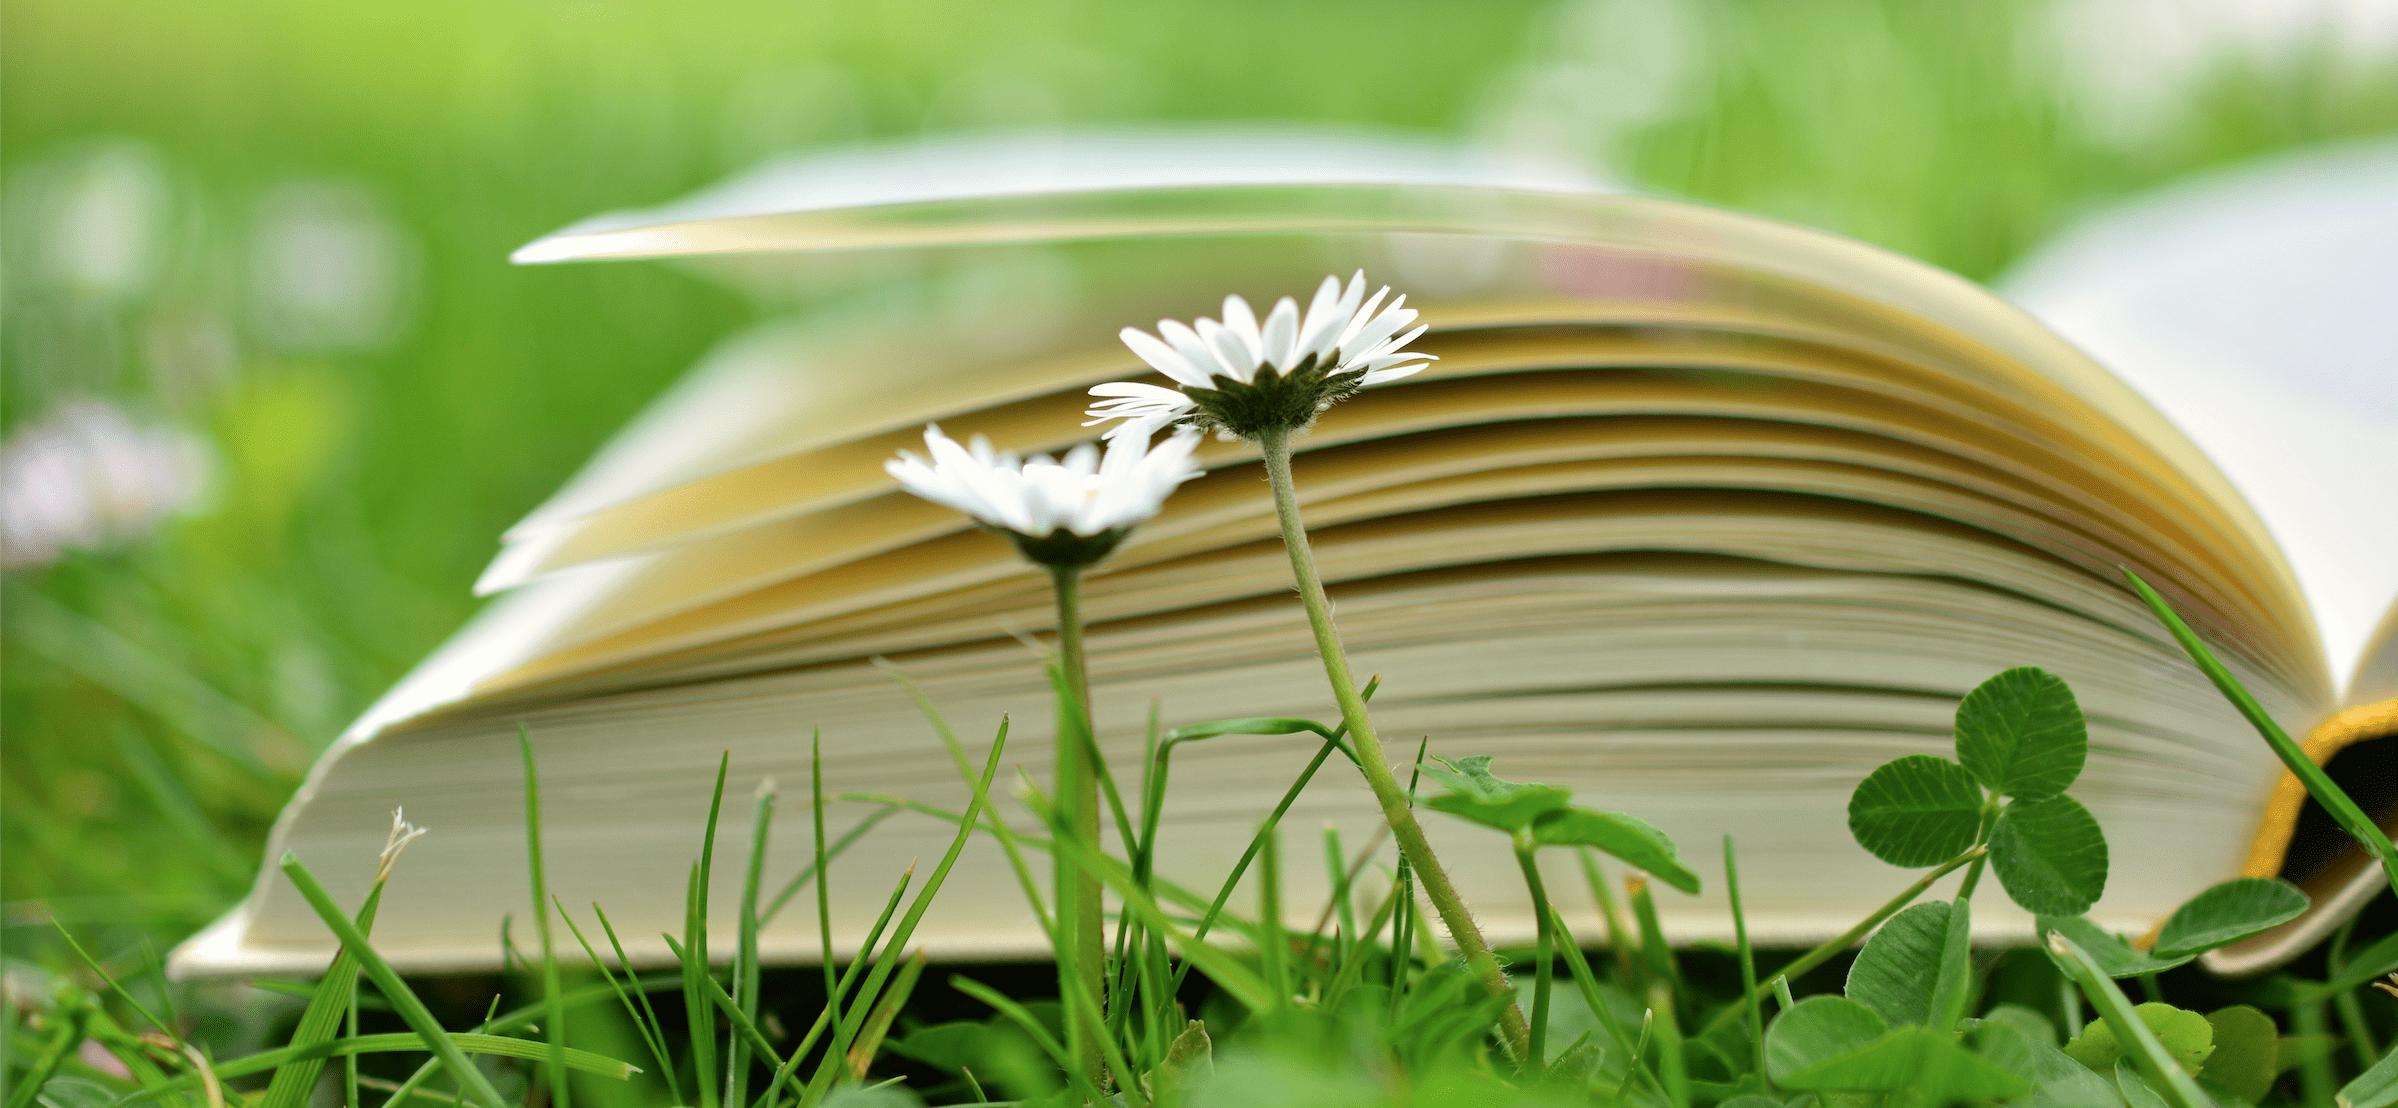 Studie, bron: Pixabay